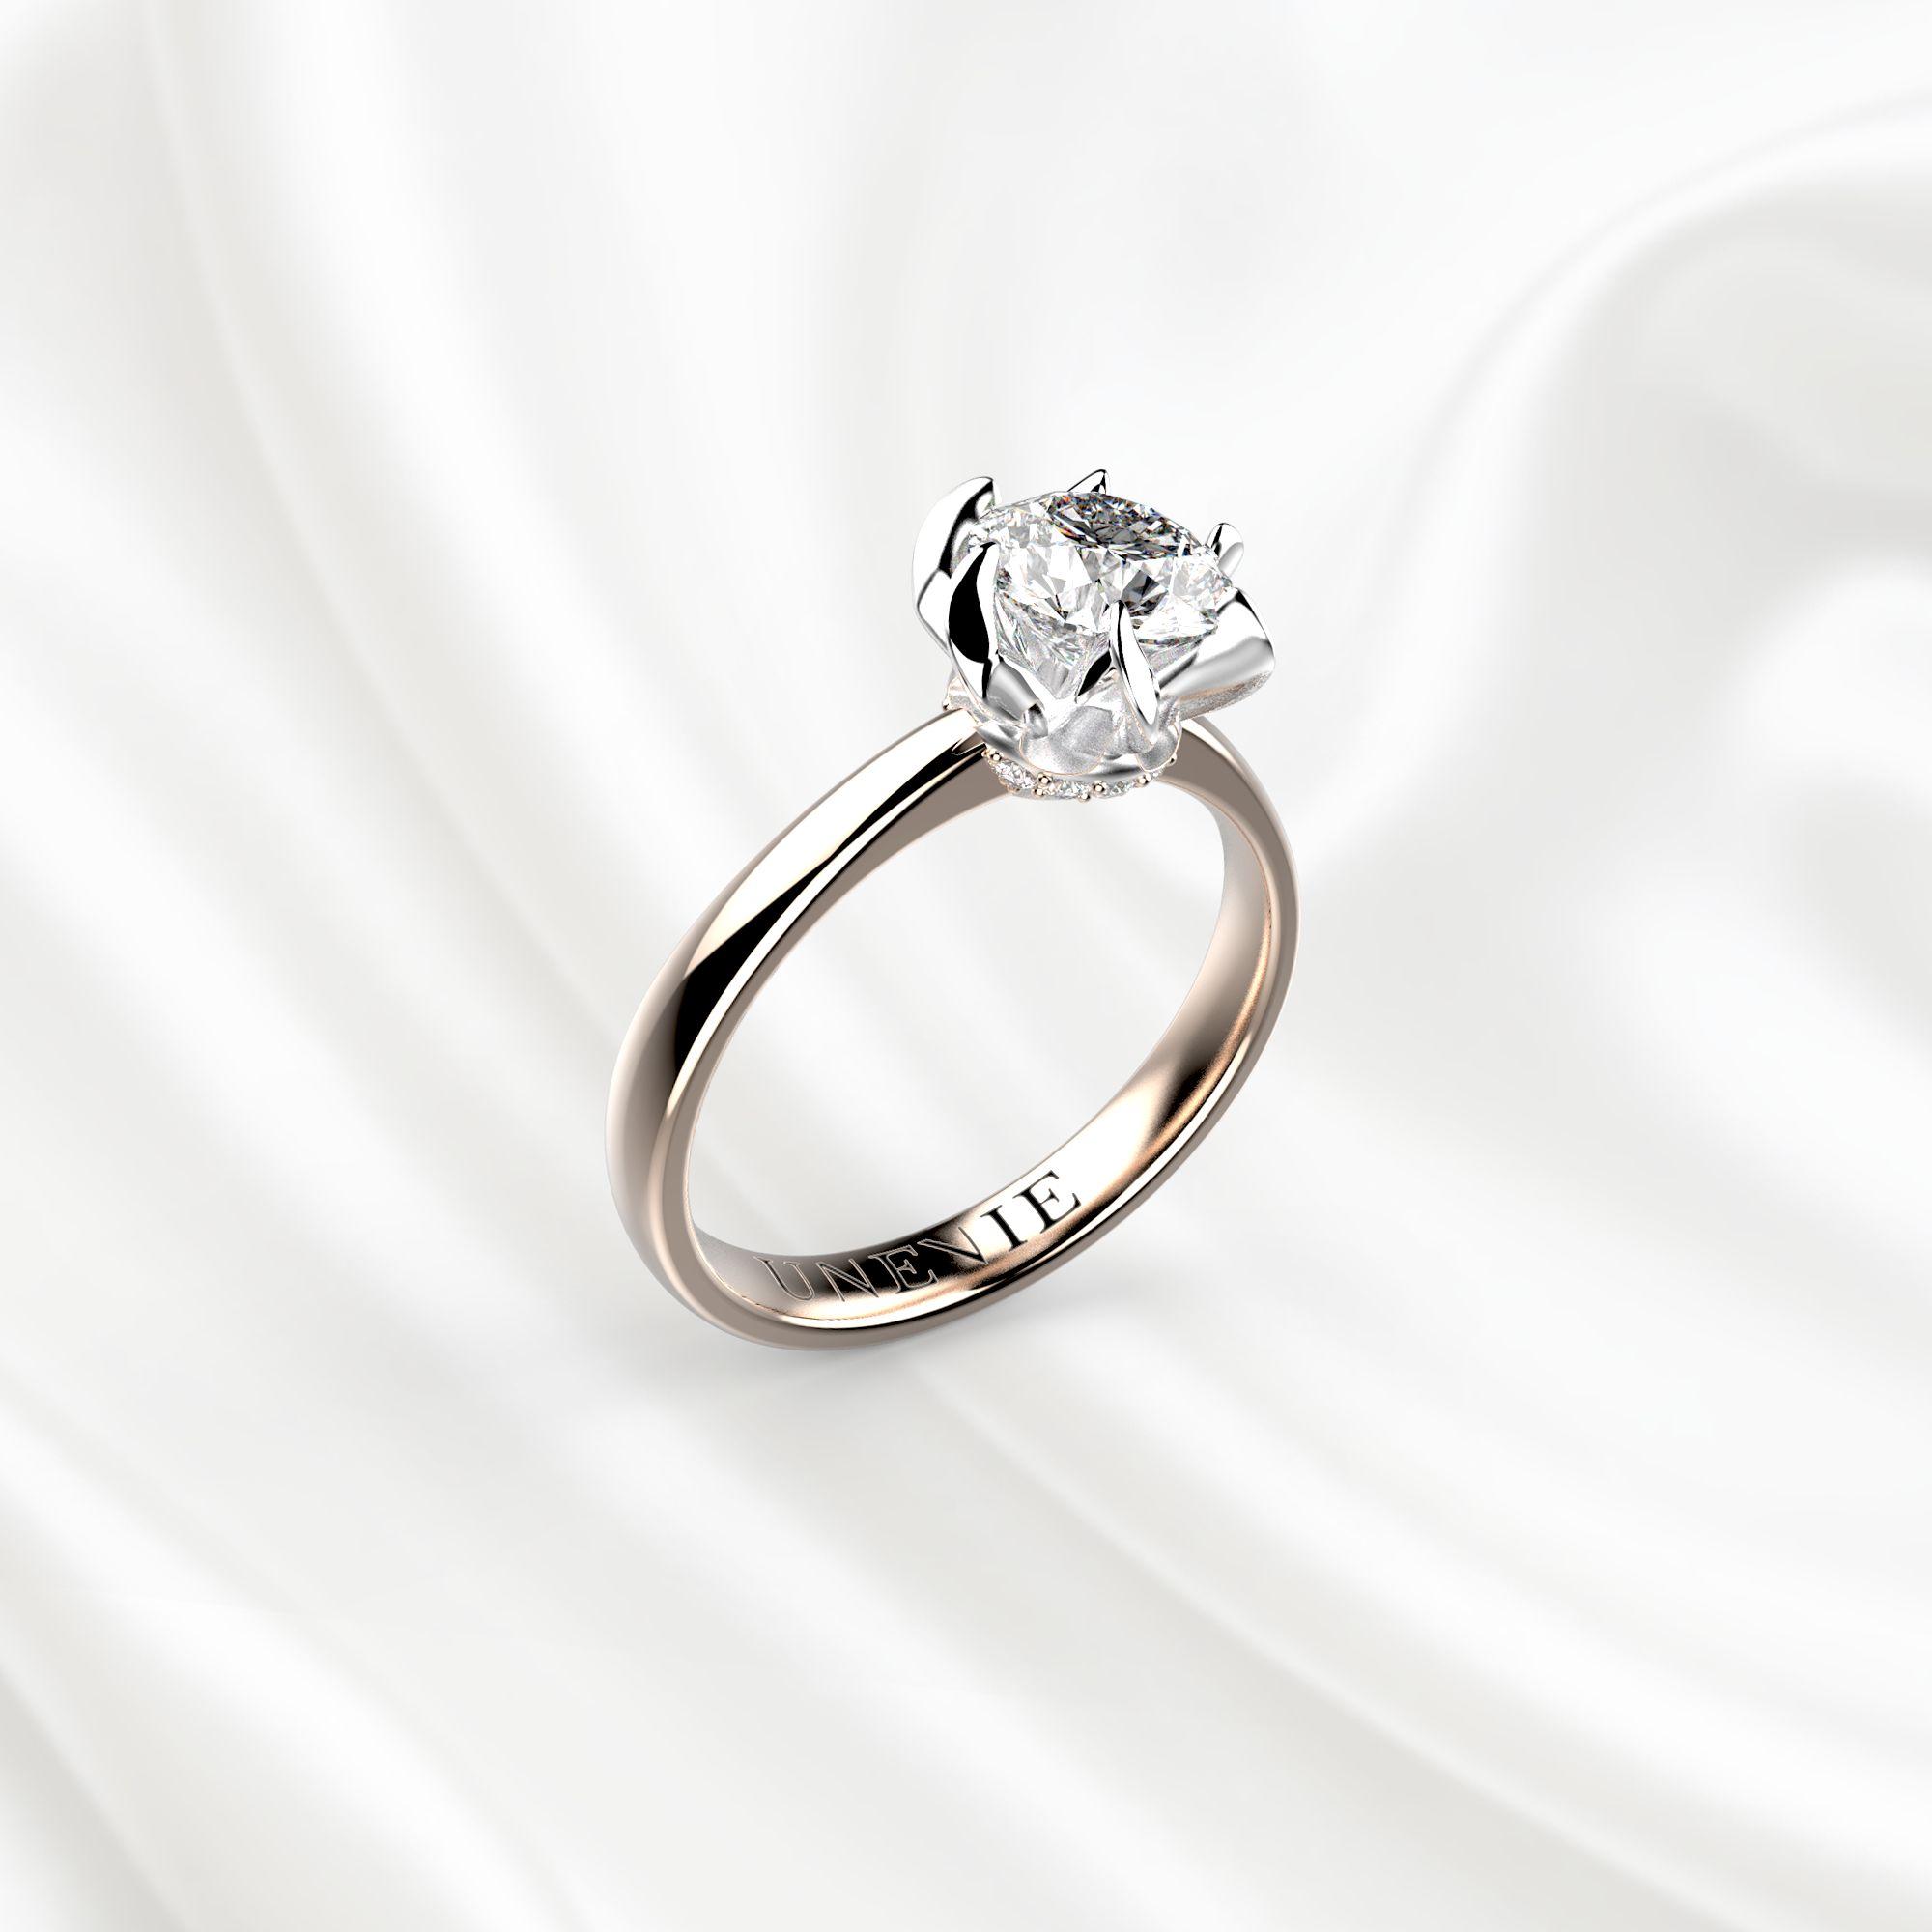 N11 Помолвочное кольцо из розово-белого золота с бриллиантом 0.7 карат